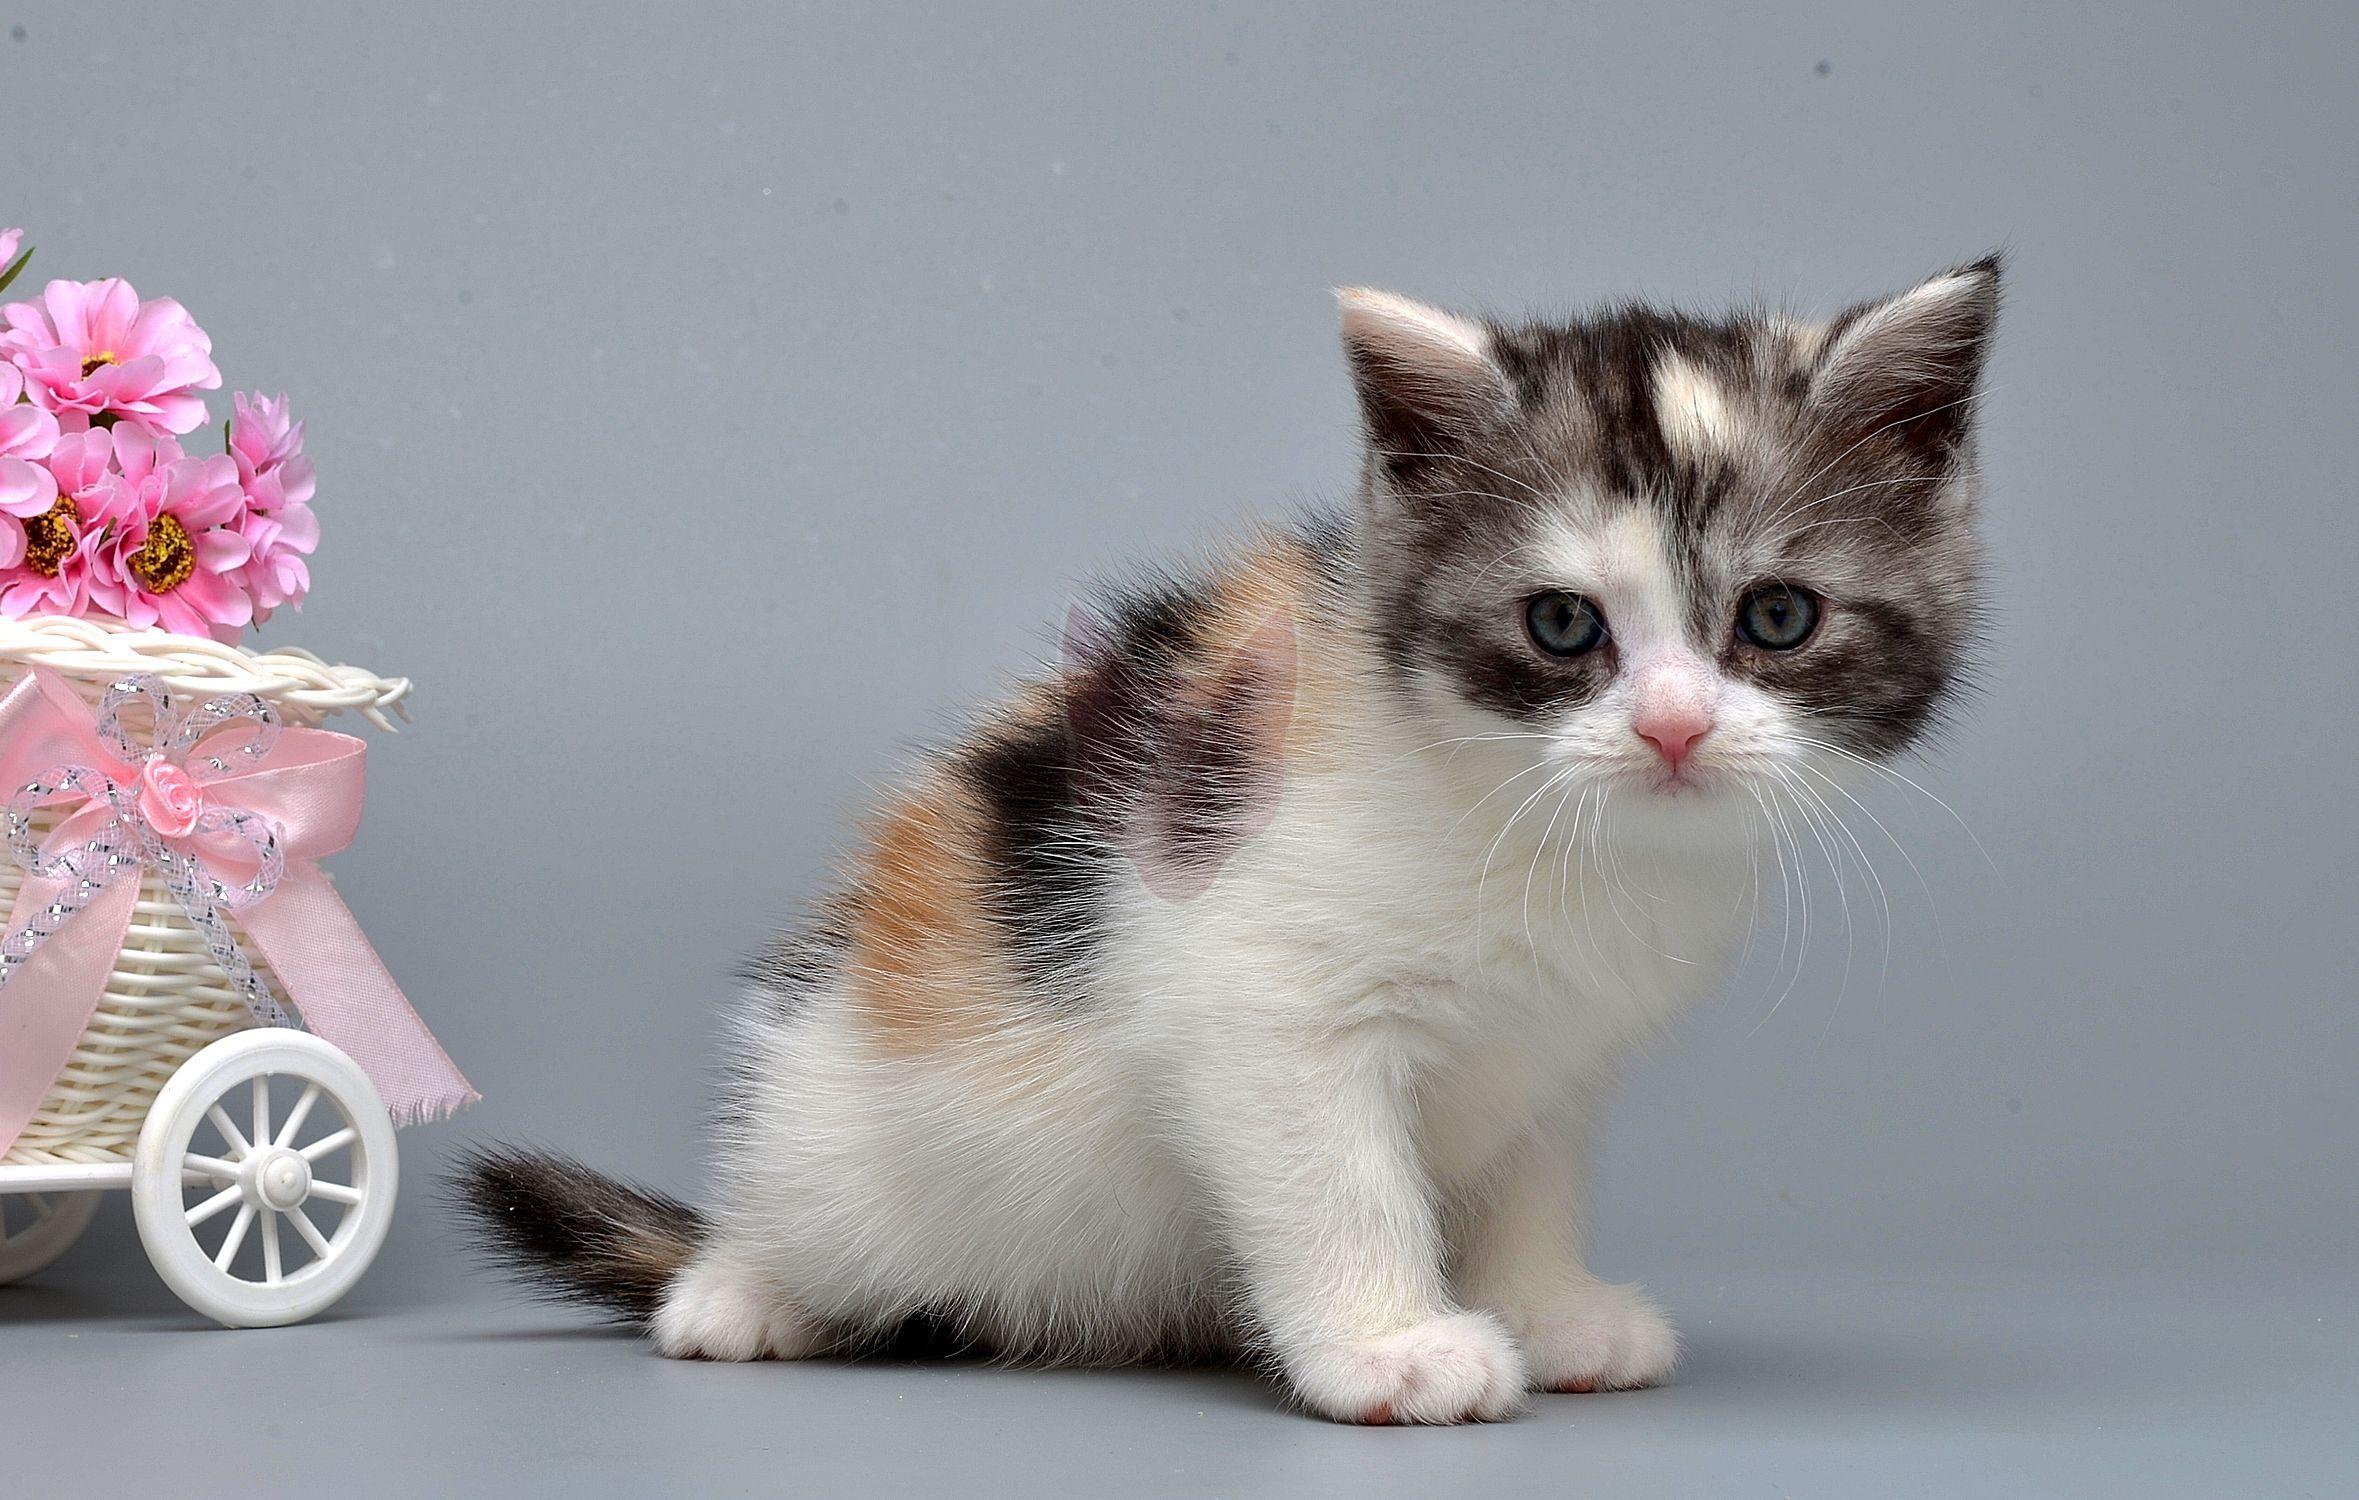 Kitten of Munchkin Murgulet